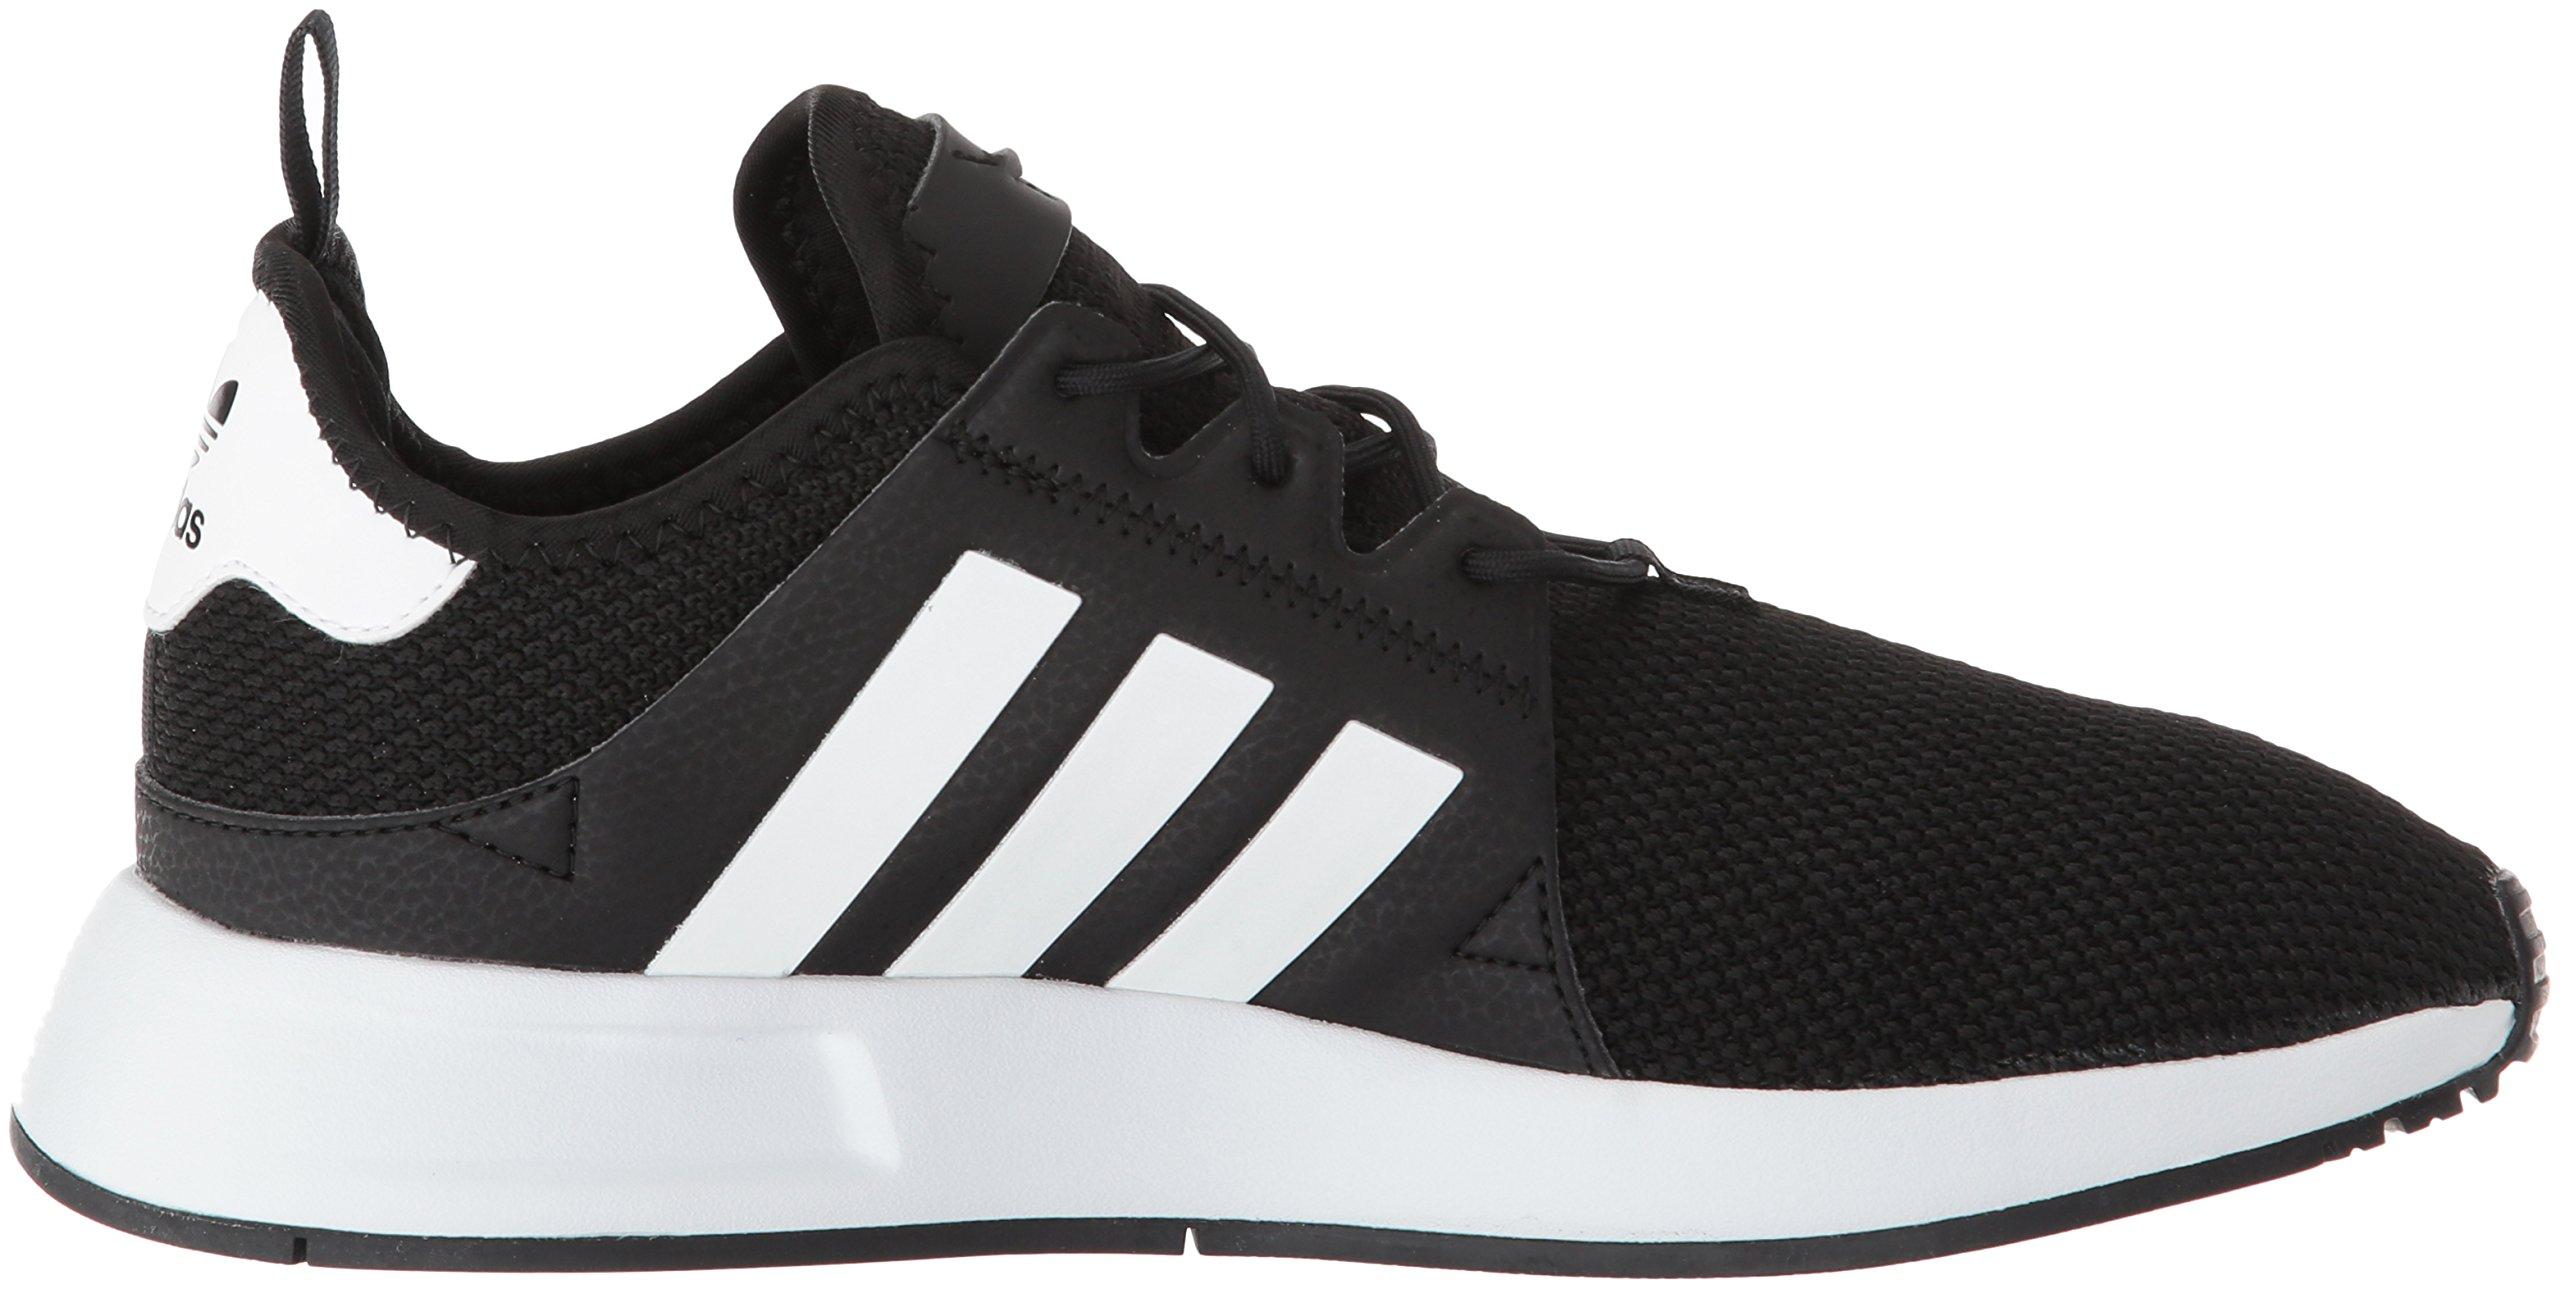 adidas Originals Mens X_PLR Running Shoe White/Black, 5 M US by adidas Originals (Image #7)